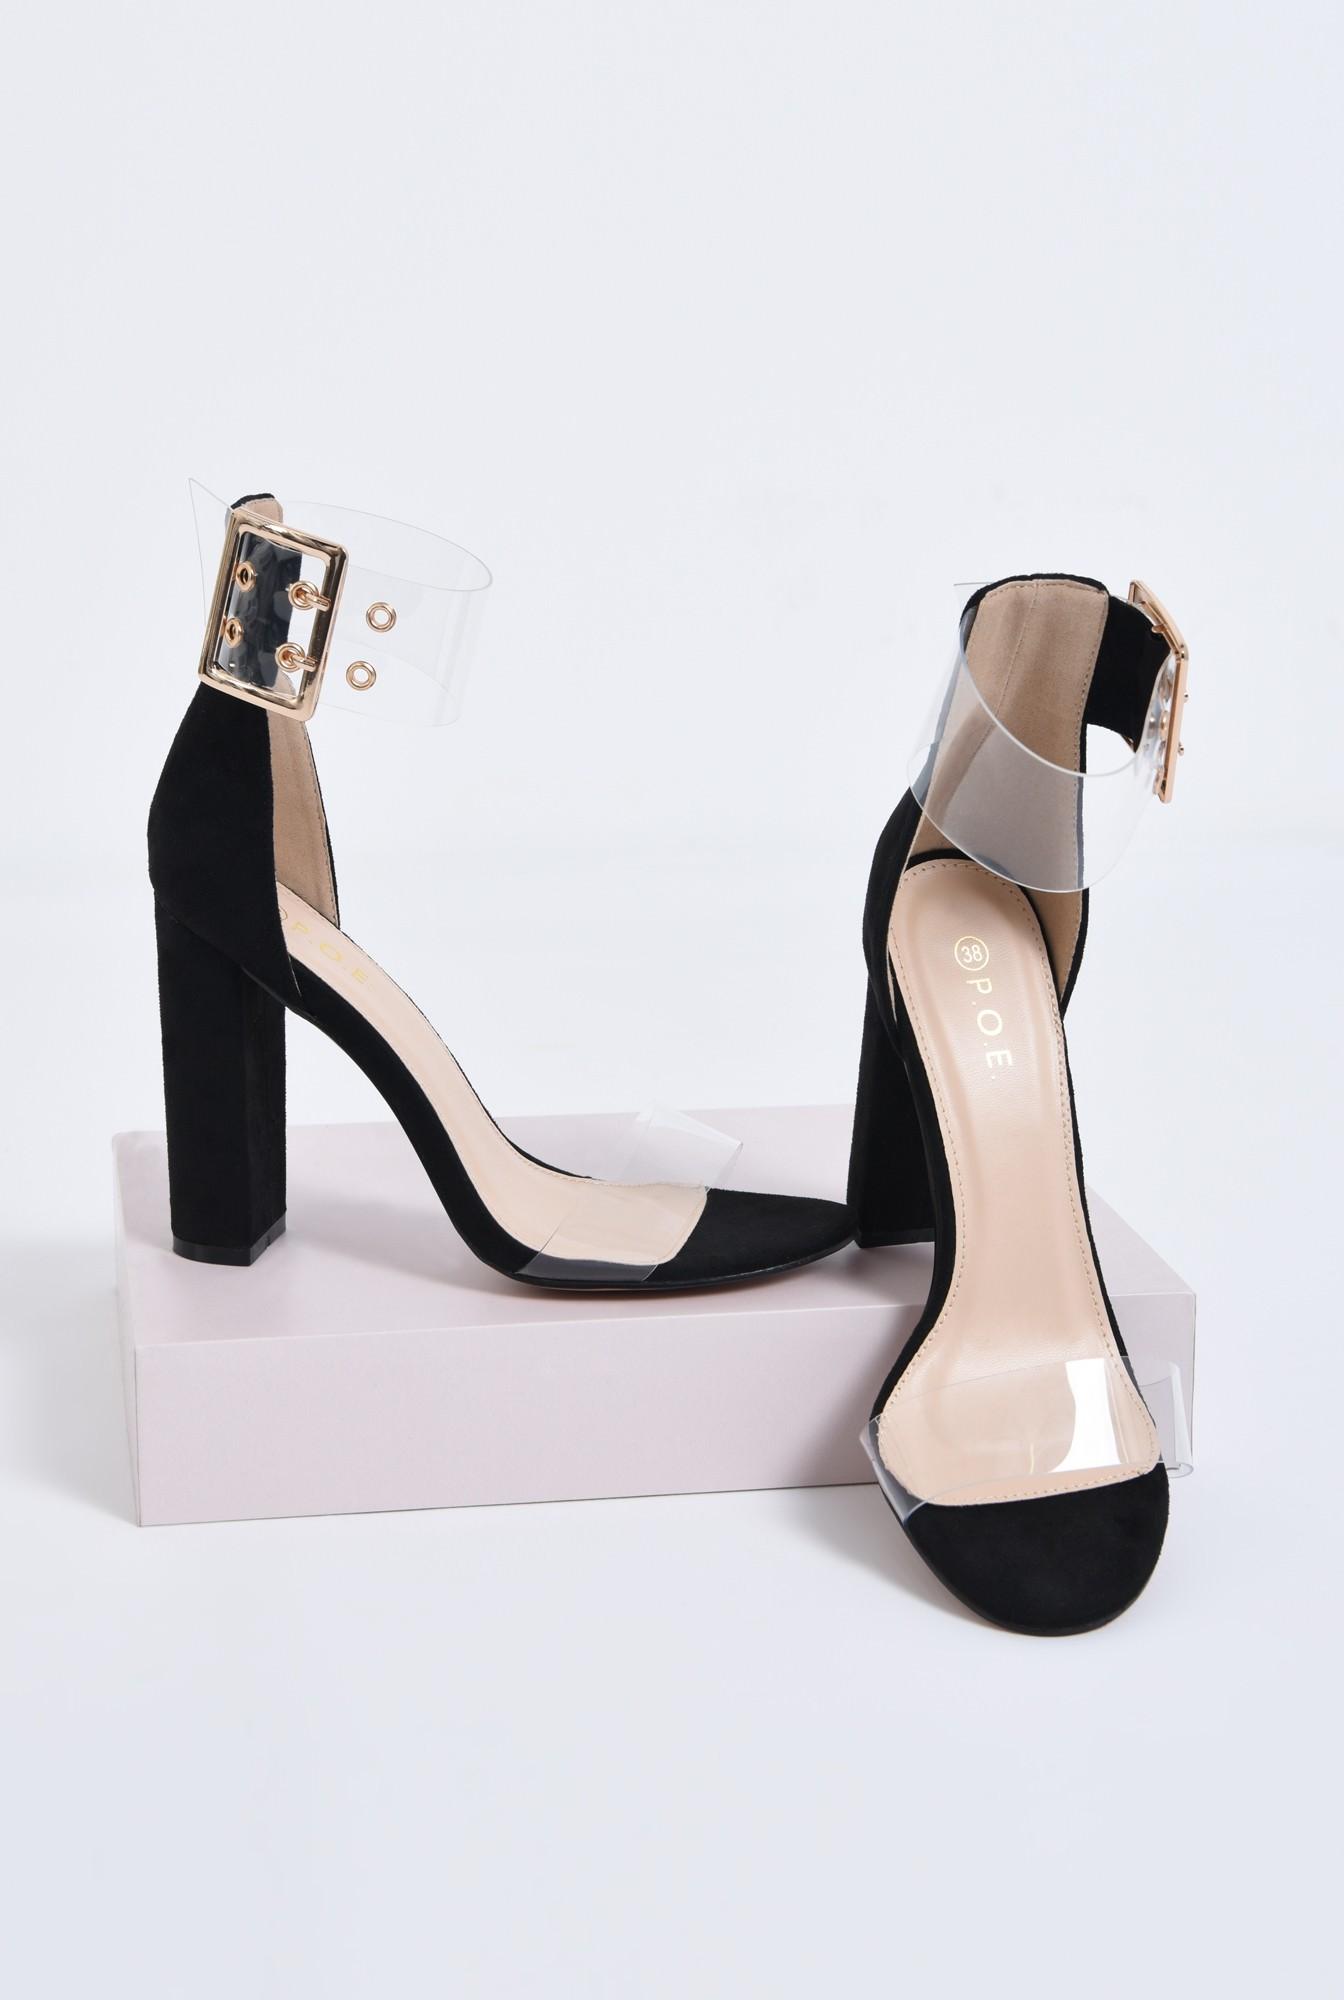 3 - sandale dama, toc gros, capse, auriu